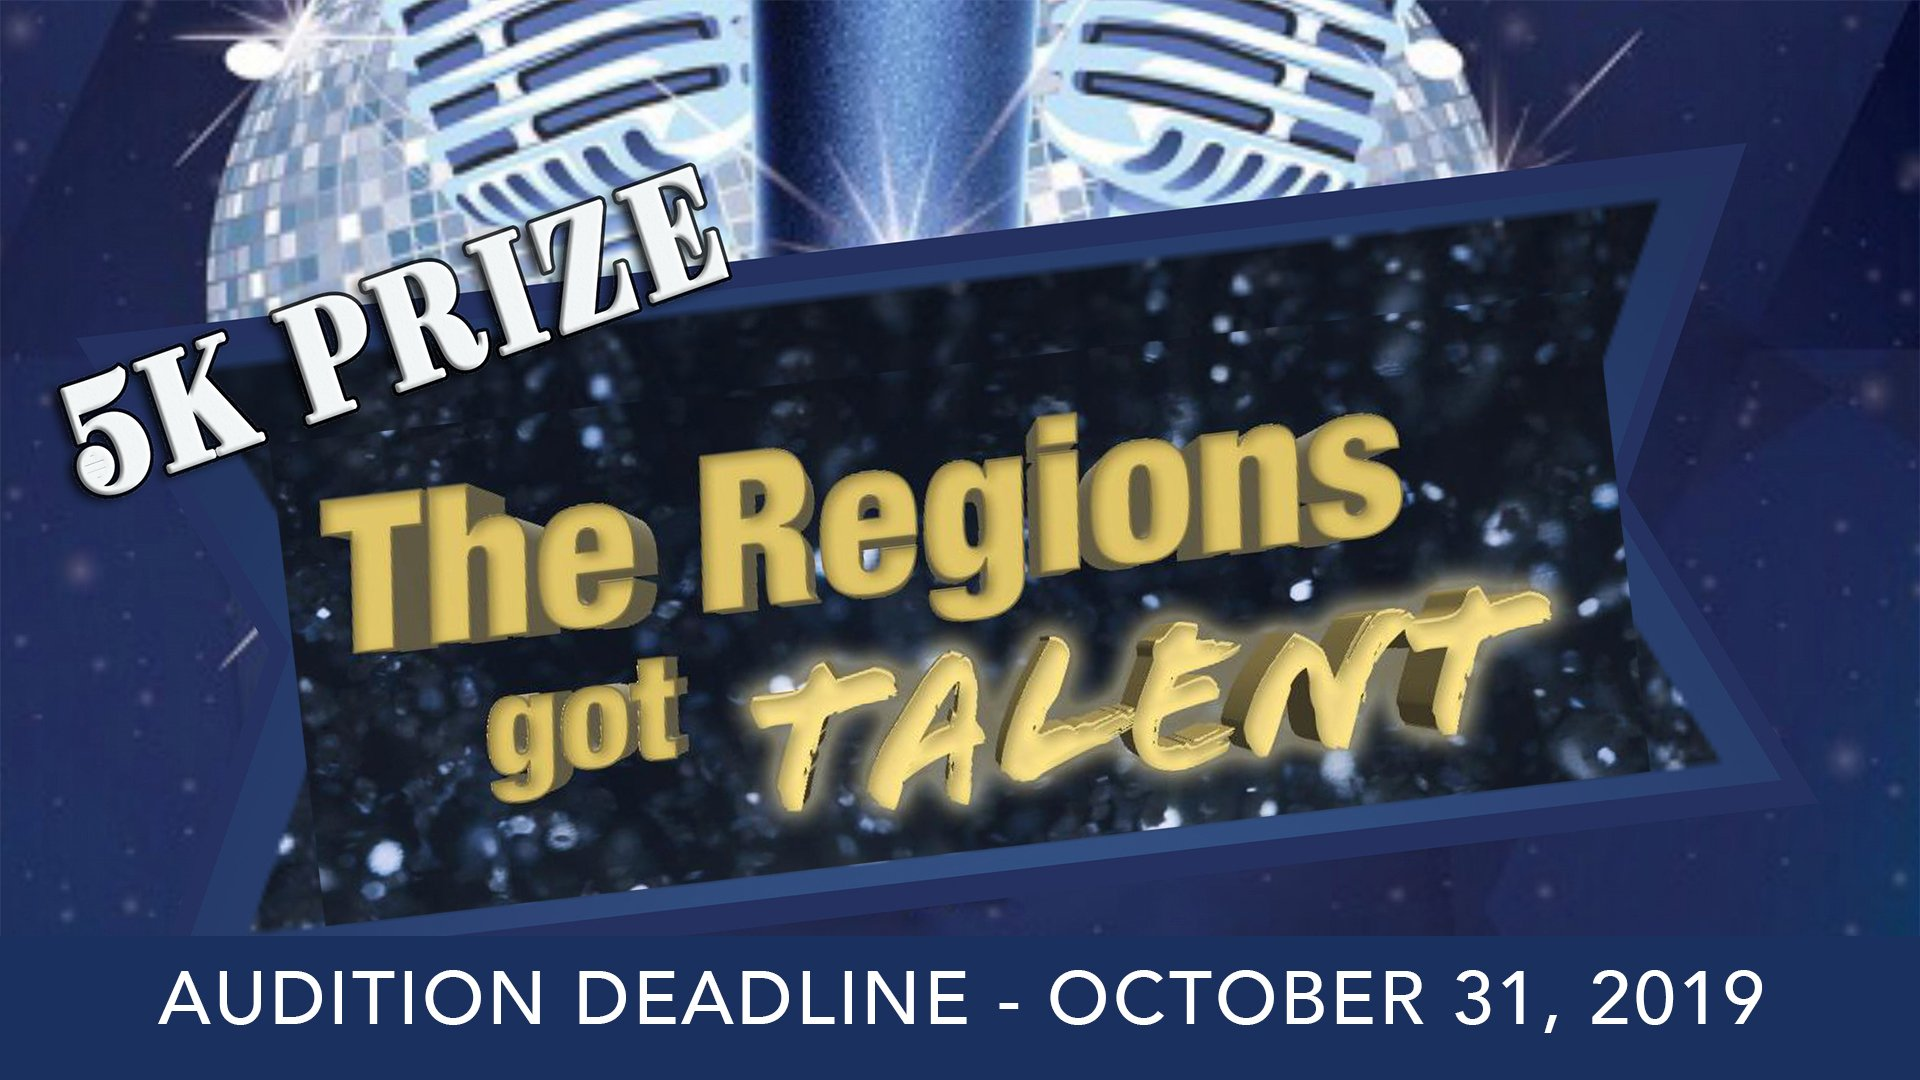 The Region's Got Talent - Indiana